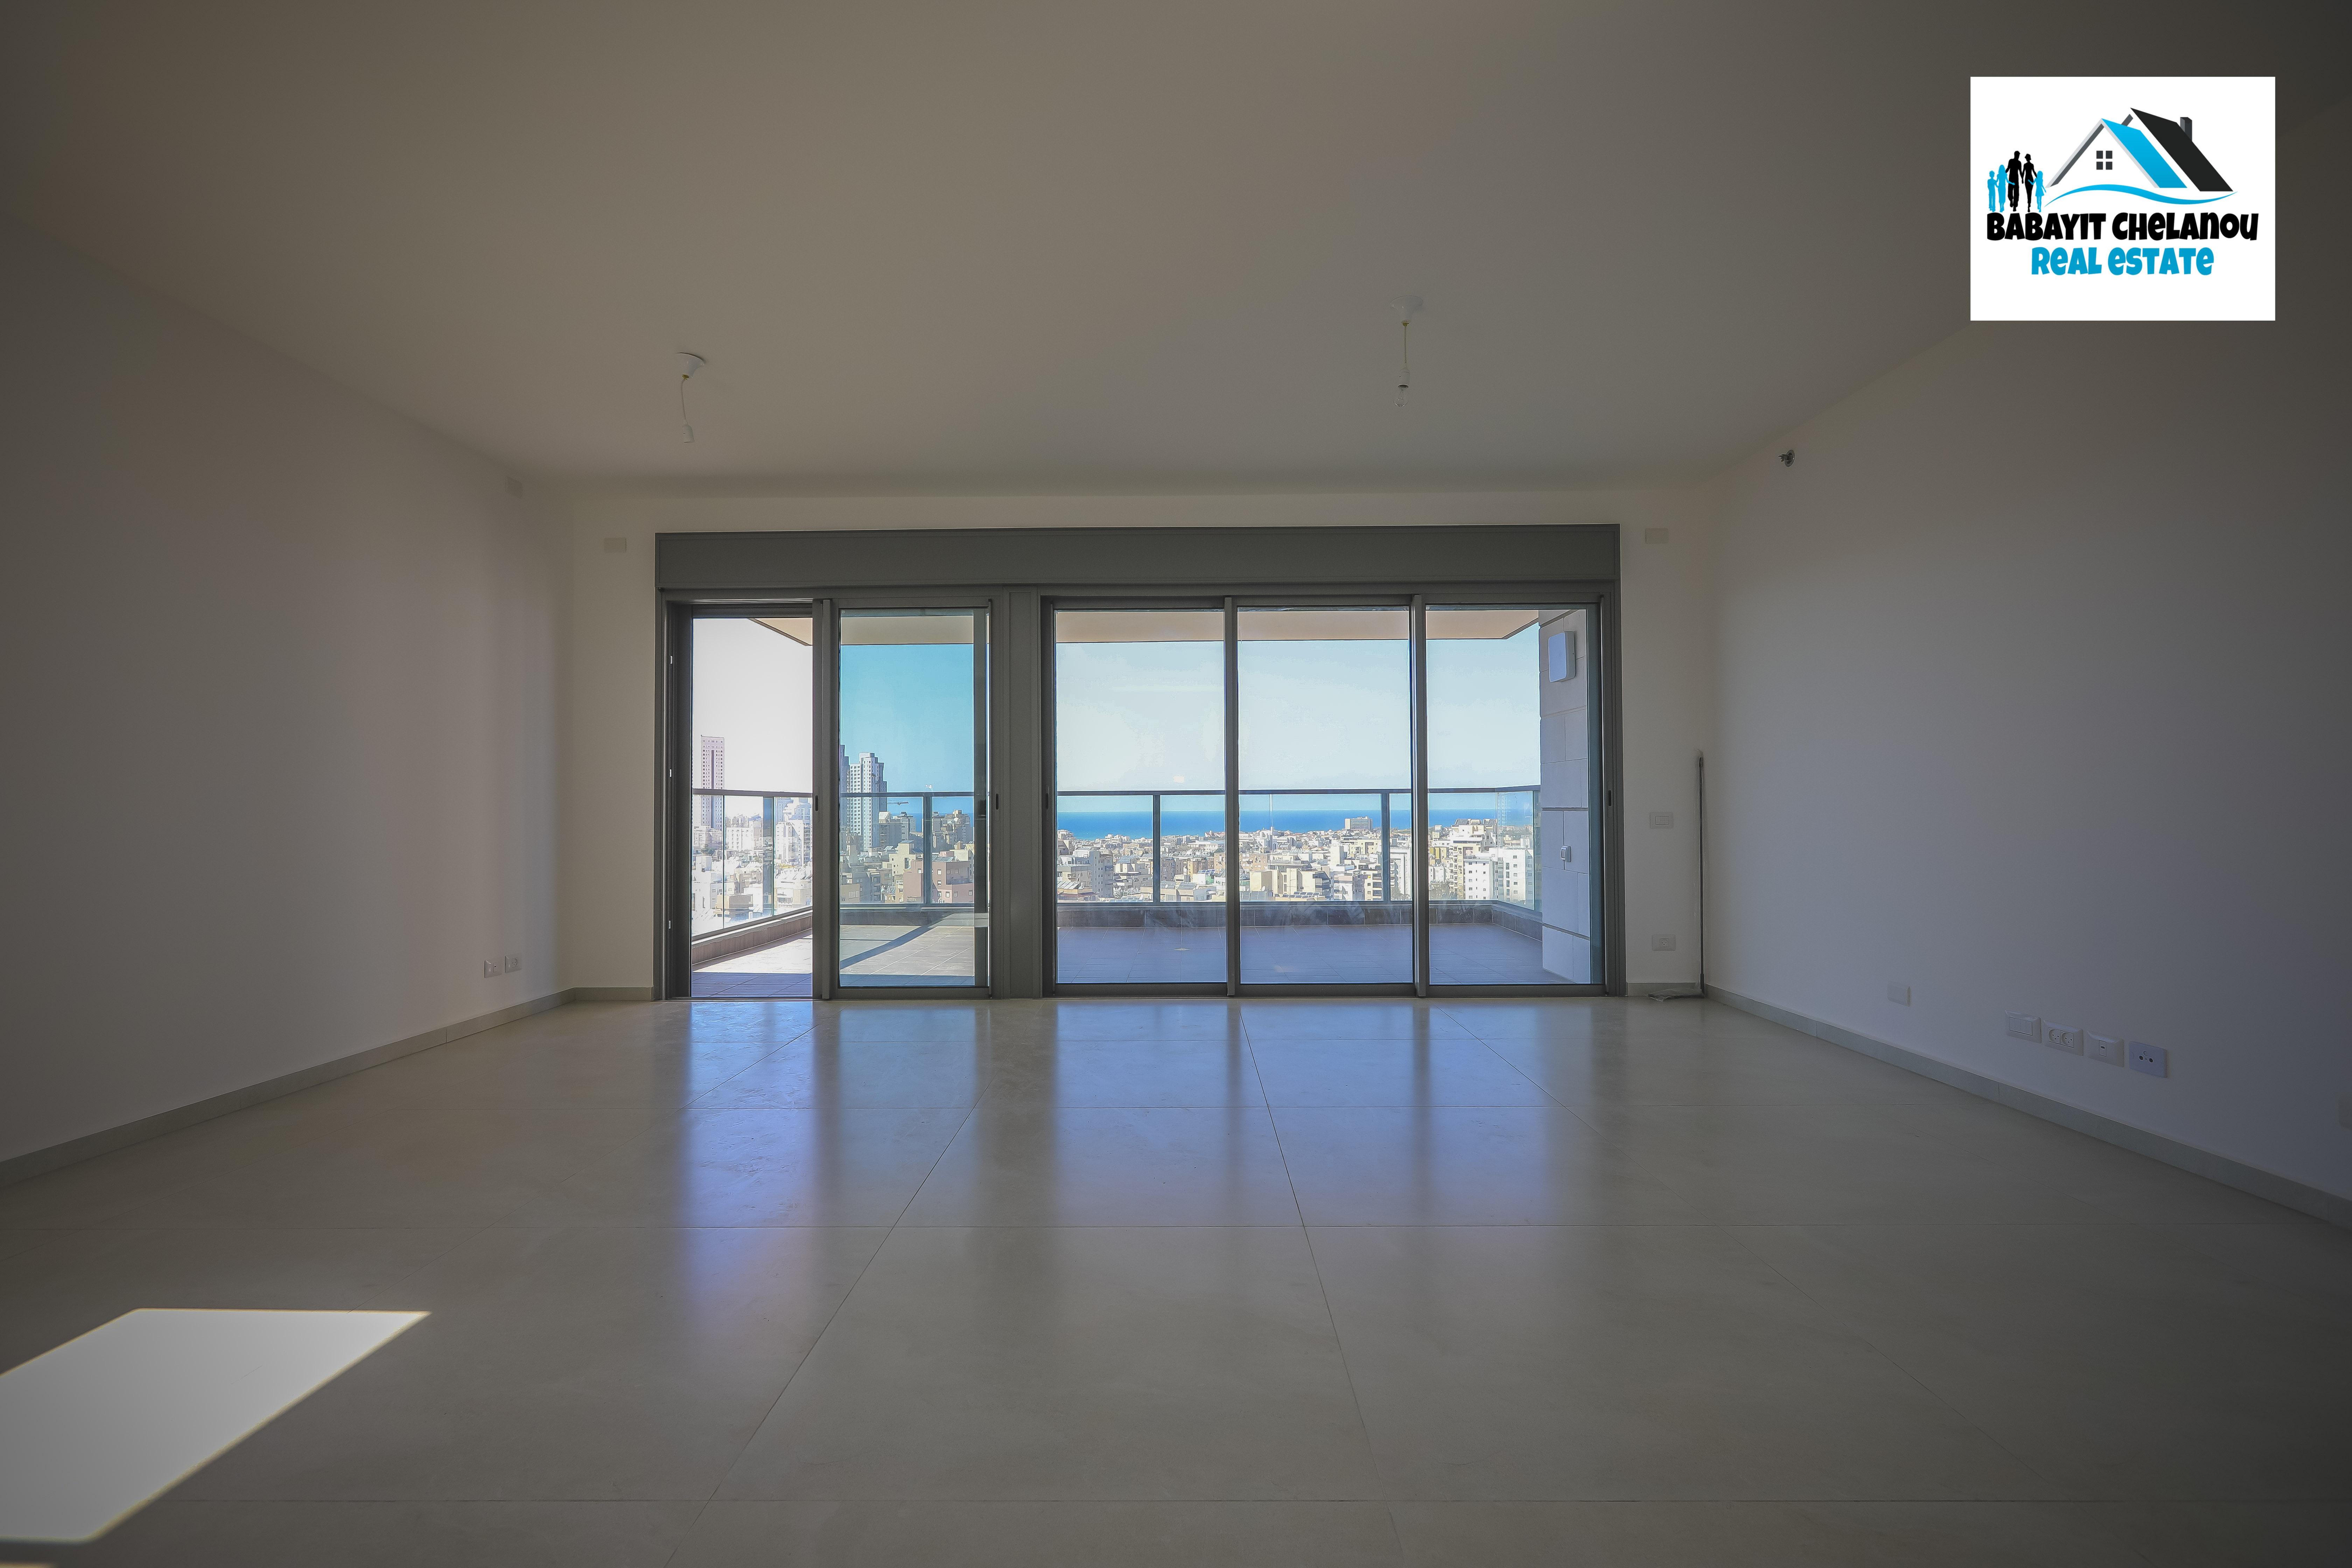 Netanya:  A vendre, Magnifique 4 pièces de 132 m2 + 25 m2 de terasse